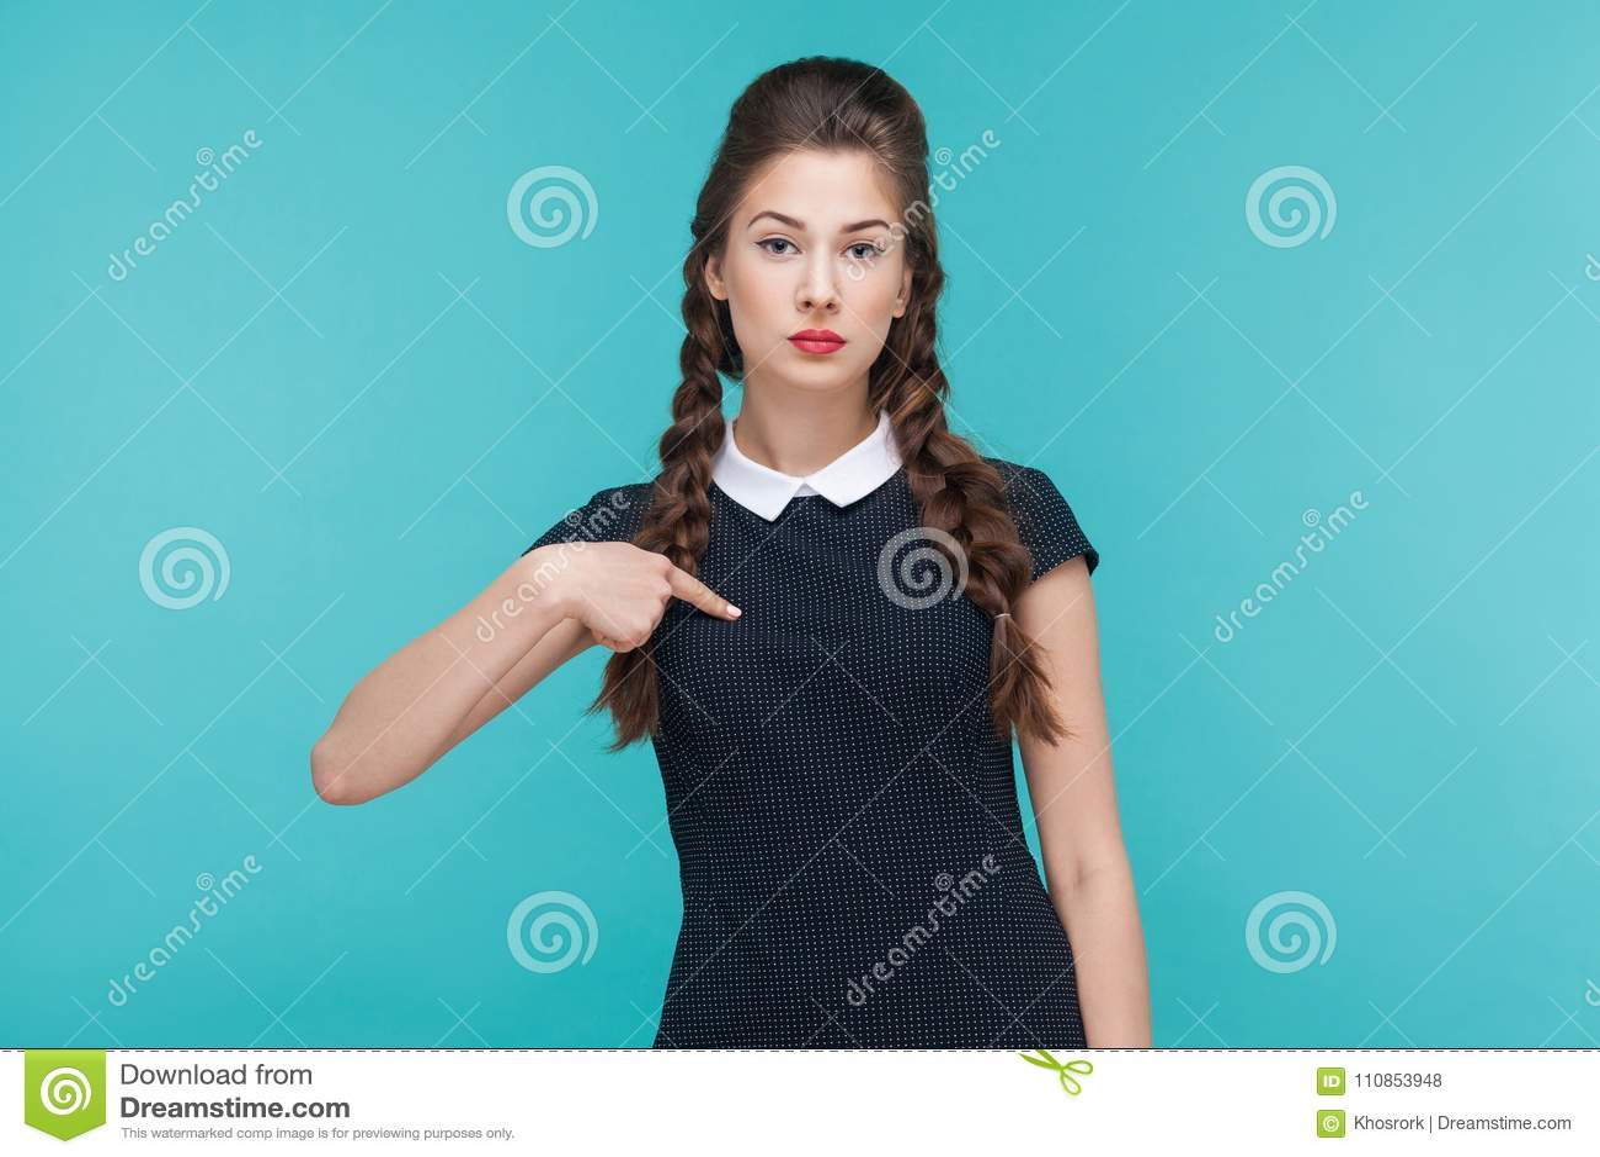 Mulher de negócios seriamente arrogante que aponta o dedo ele mesmo, lookin